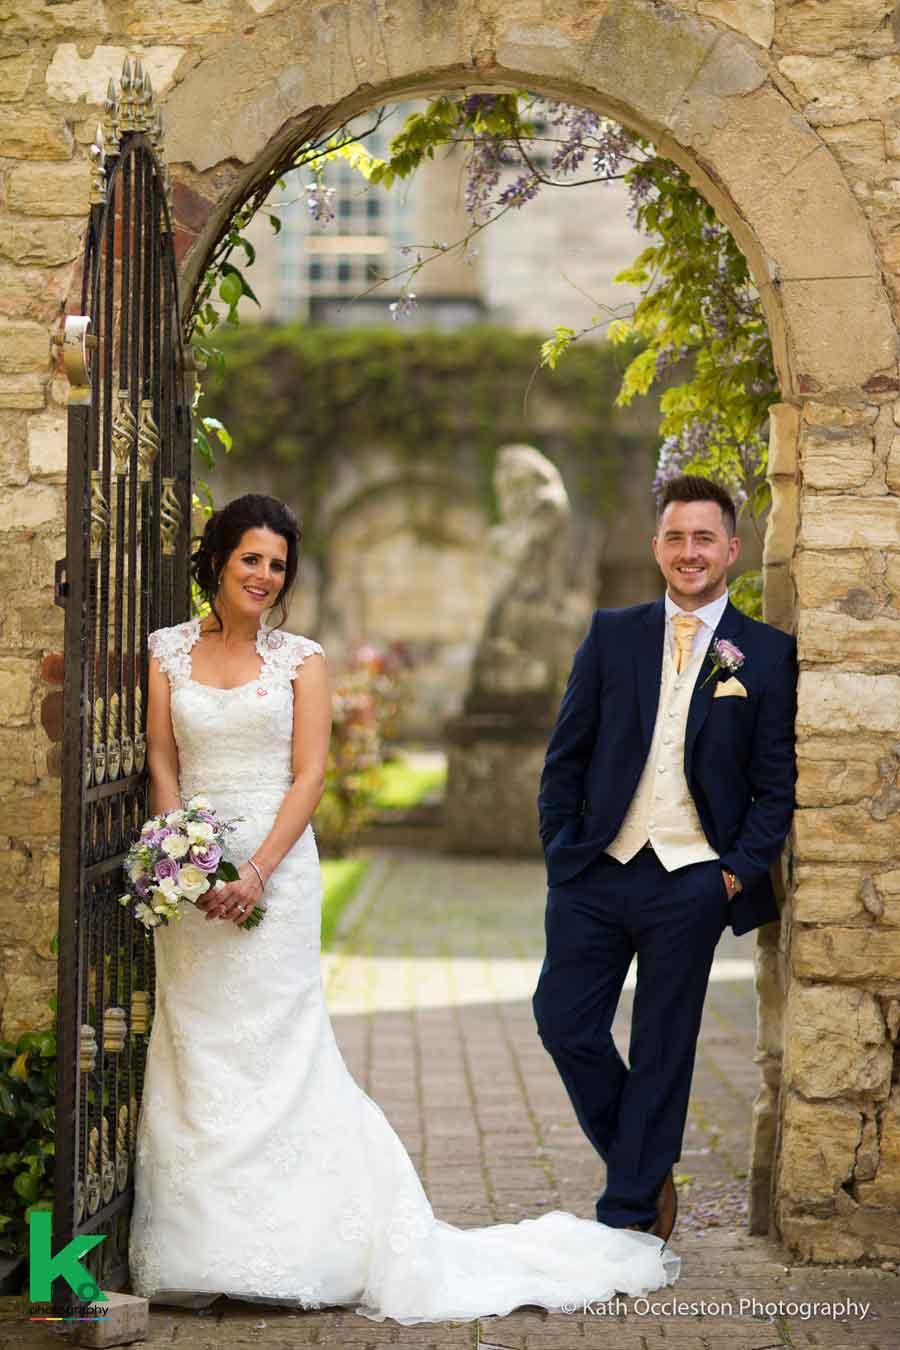 Castle wedding photography - Kath Occleston Photography